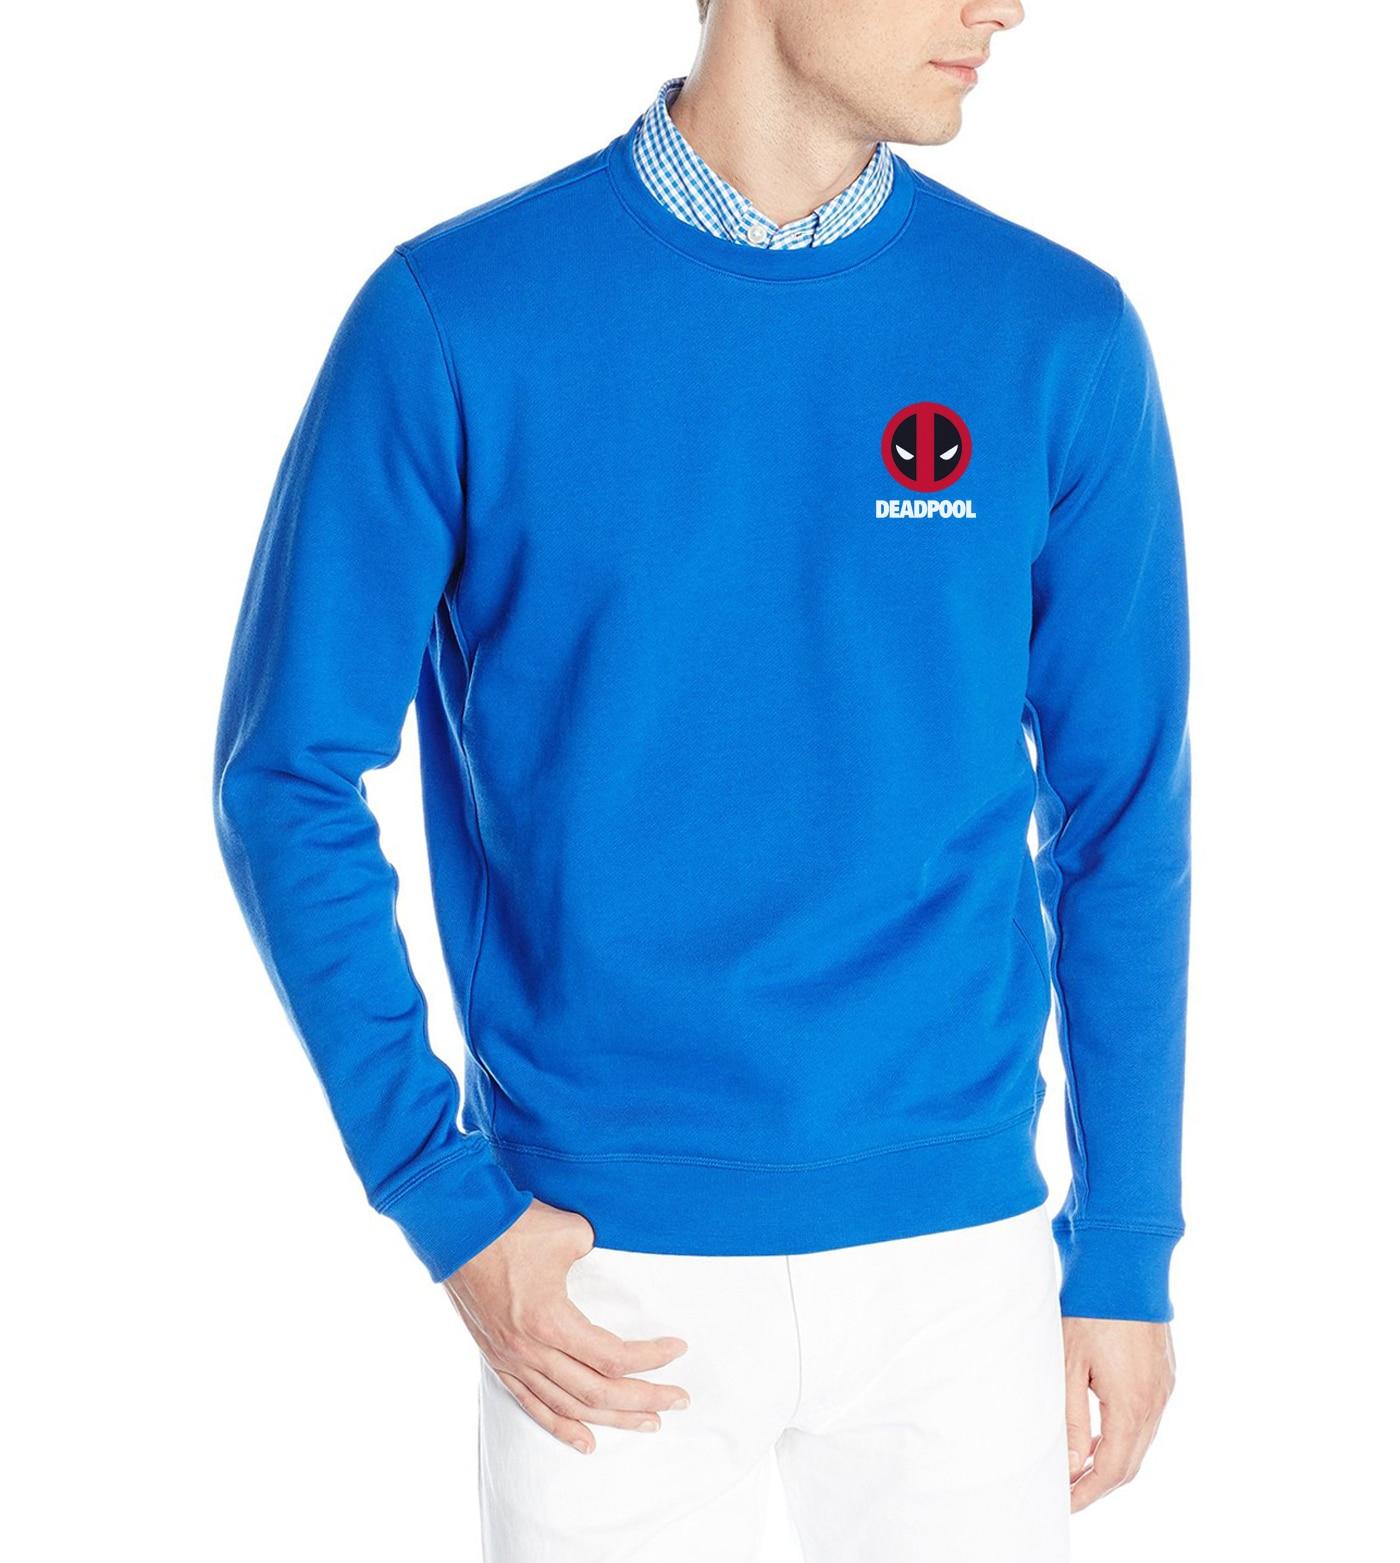 2019  fitness hip-hop pullovers men's marvel deadpool printed hoodis fashion o-neck brand tracksuit autumn winter sweatshirts